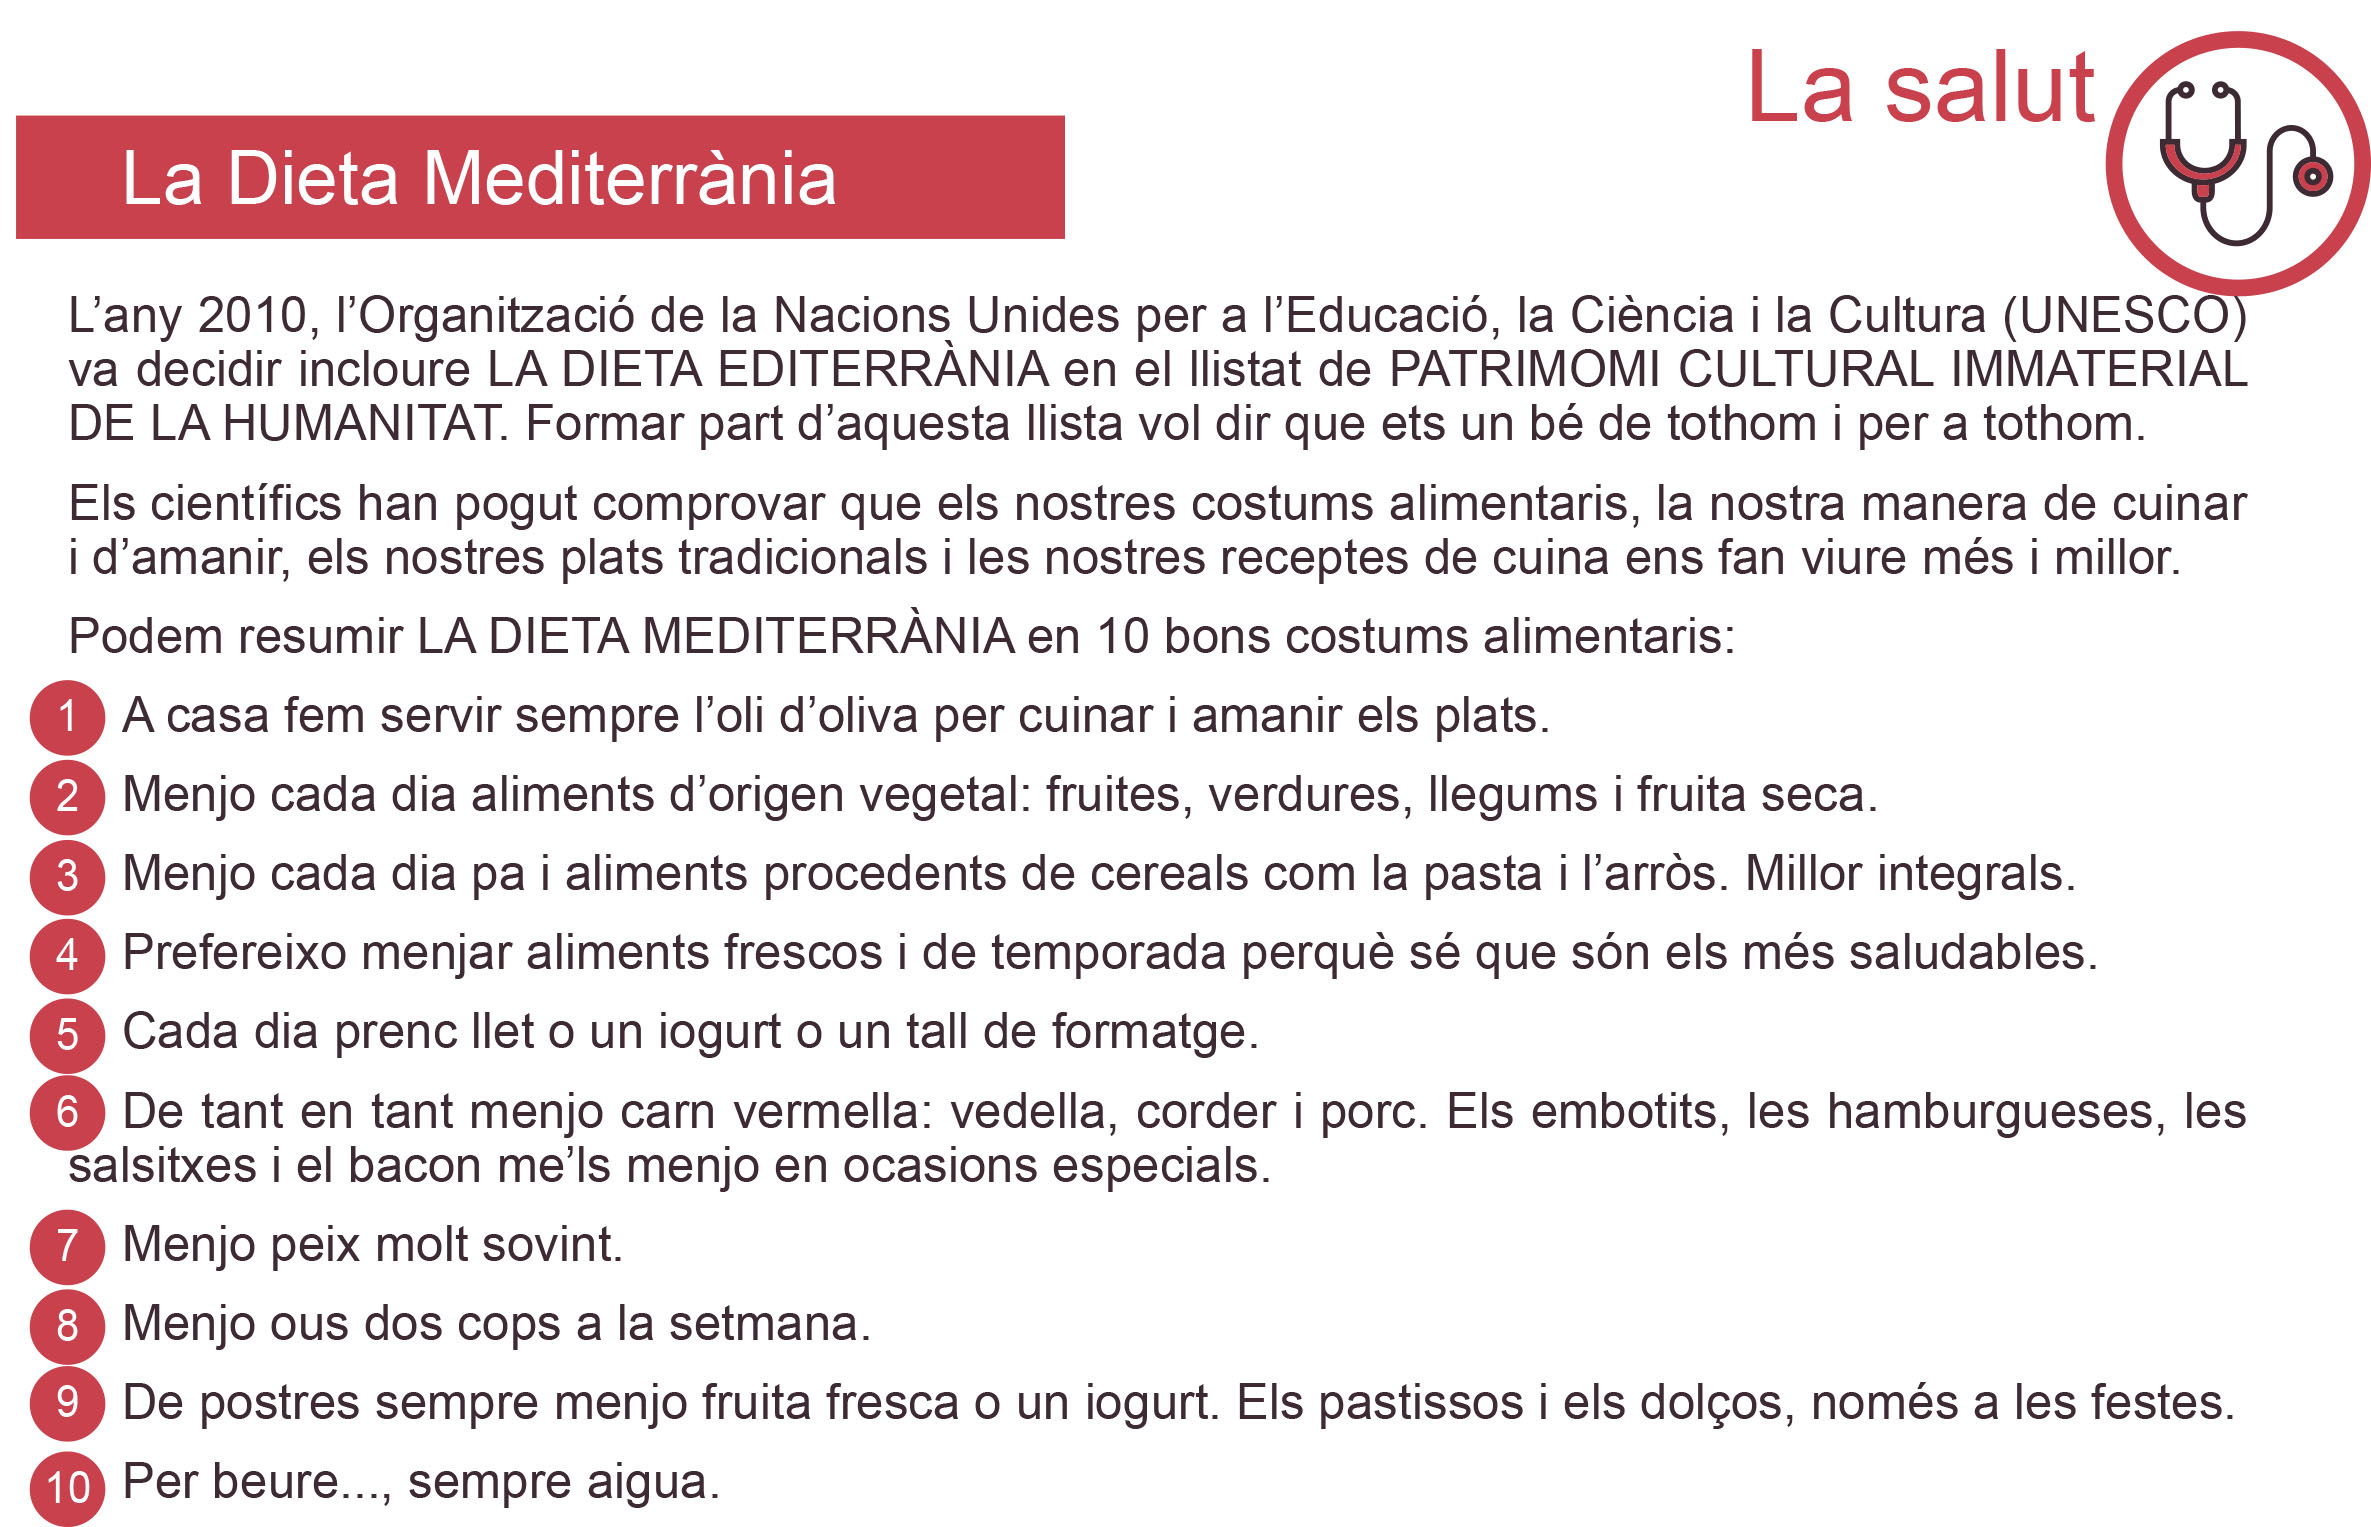 CM-3.1. La dieta mediterrània